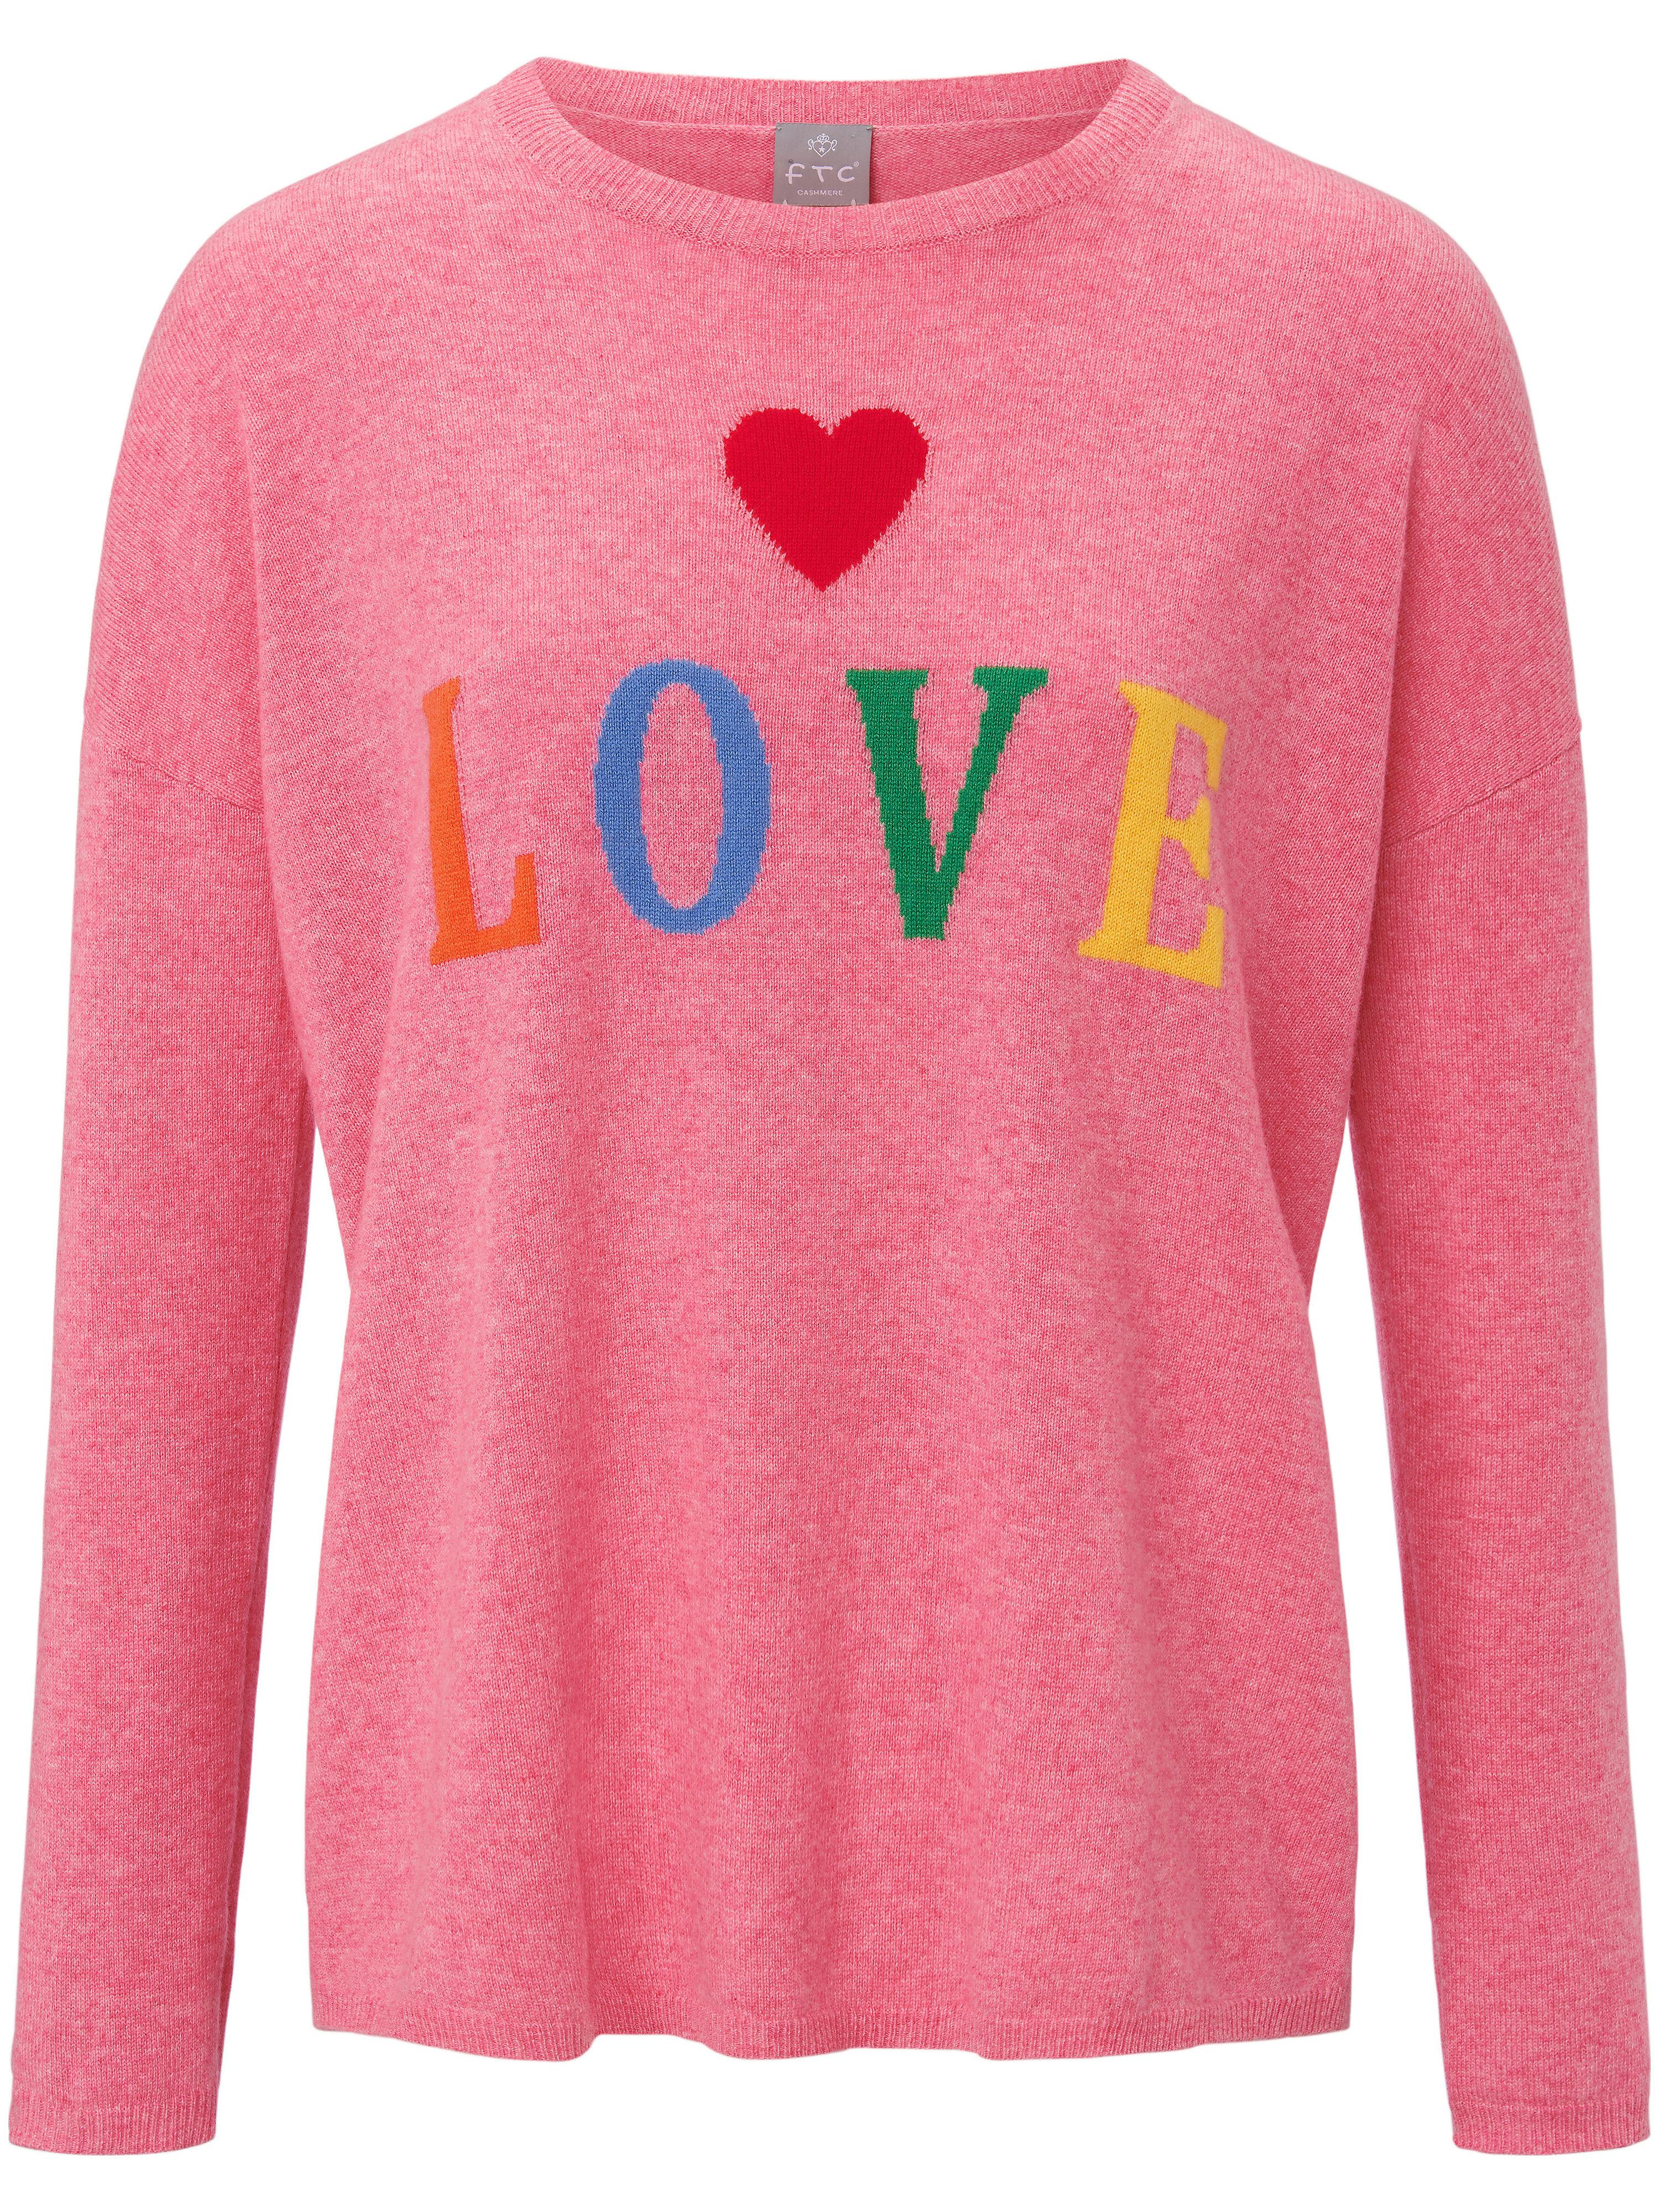 FTC Cashmere Rundhalsad tröja i 100% kashmir från FTC Cashmere cerise